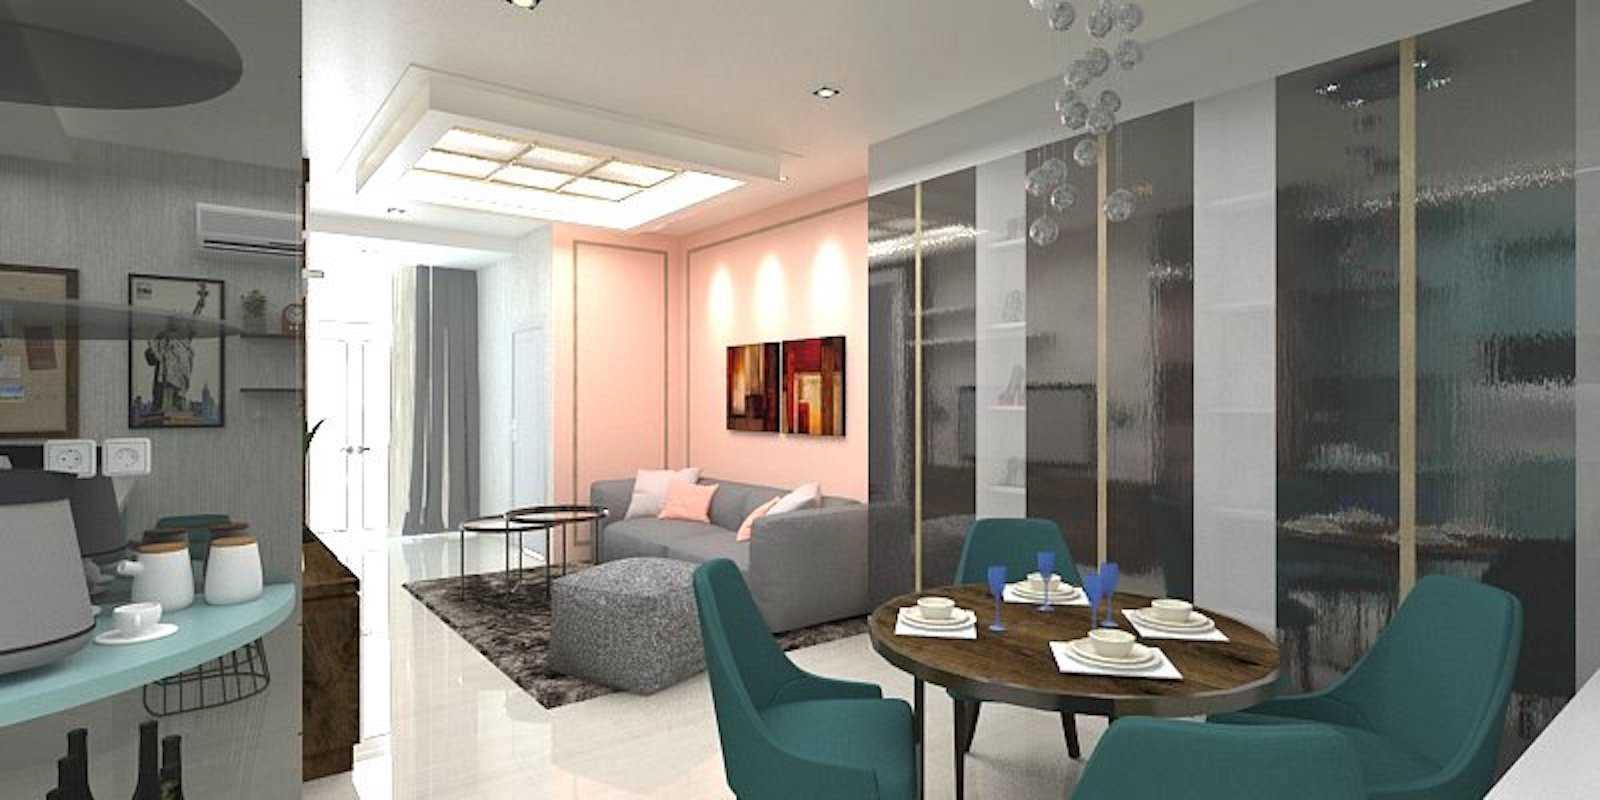 Graharupa Cipta Kirana Mrs S Residence Jakarta Jakarta Living And Dining Area Klasik  29480